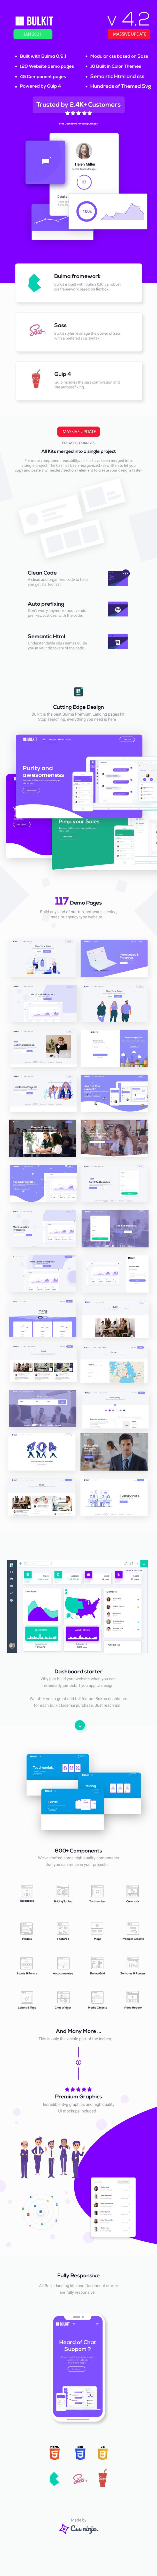 bulkit infographics next - Bulkit - Saas Landing Pages